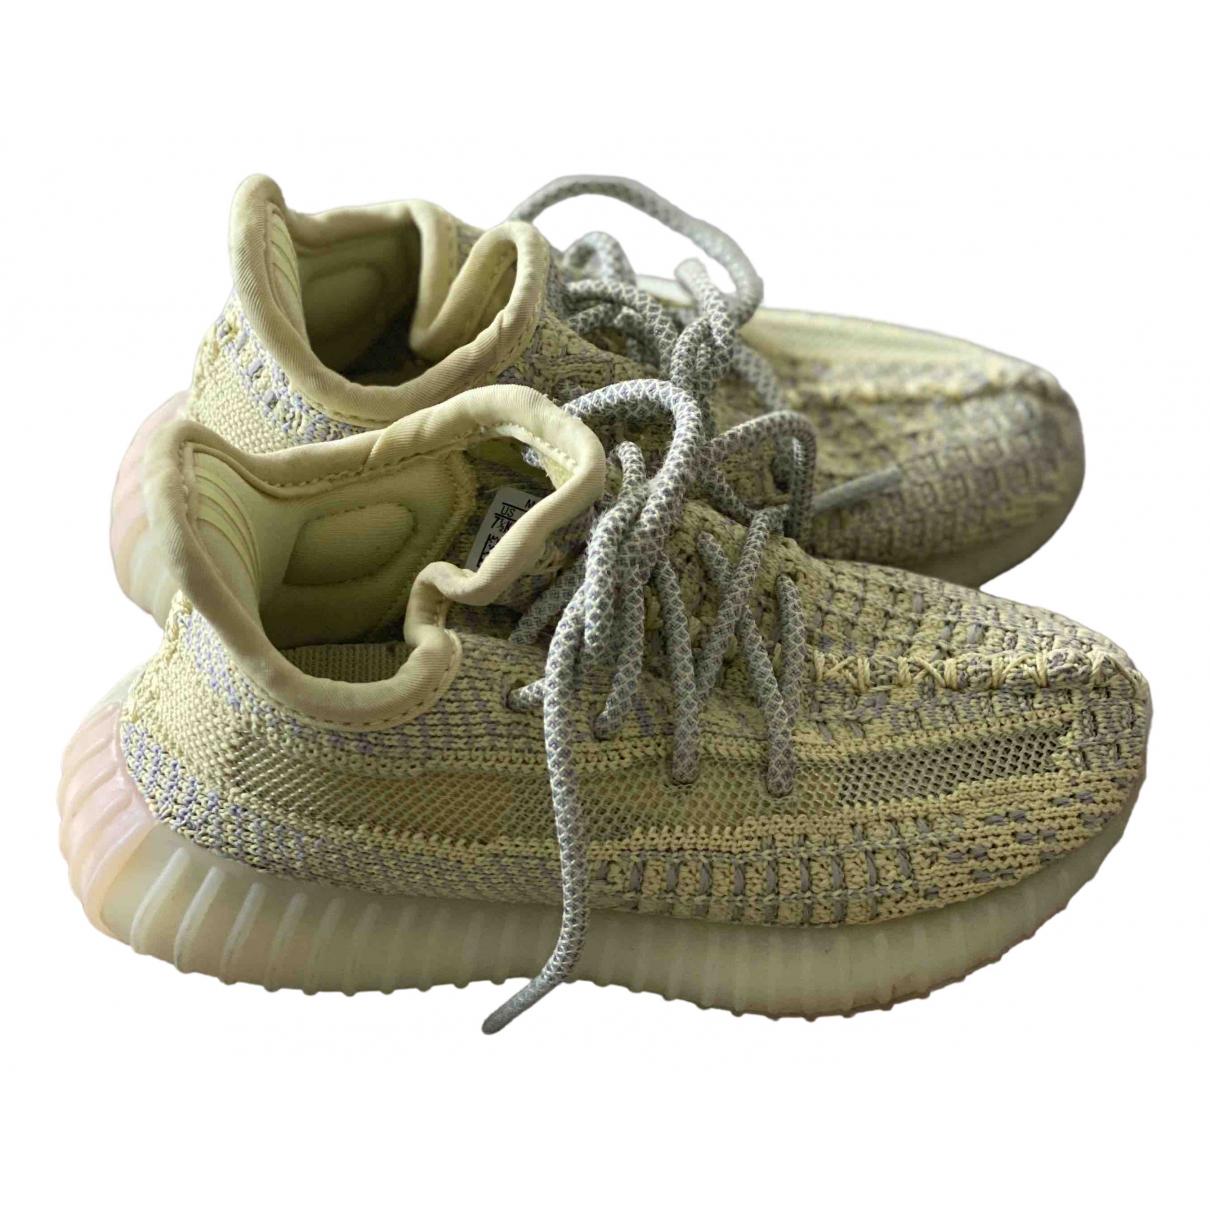 Yeezy X Adidas - Baskets Boost 350 V2 pour enfant - vert